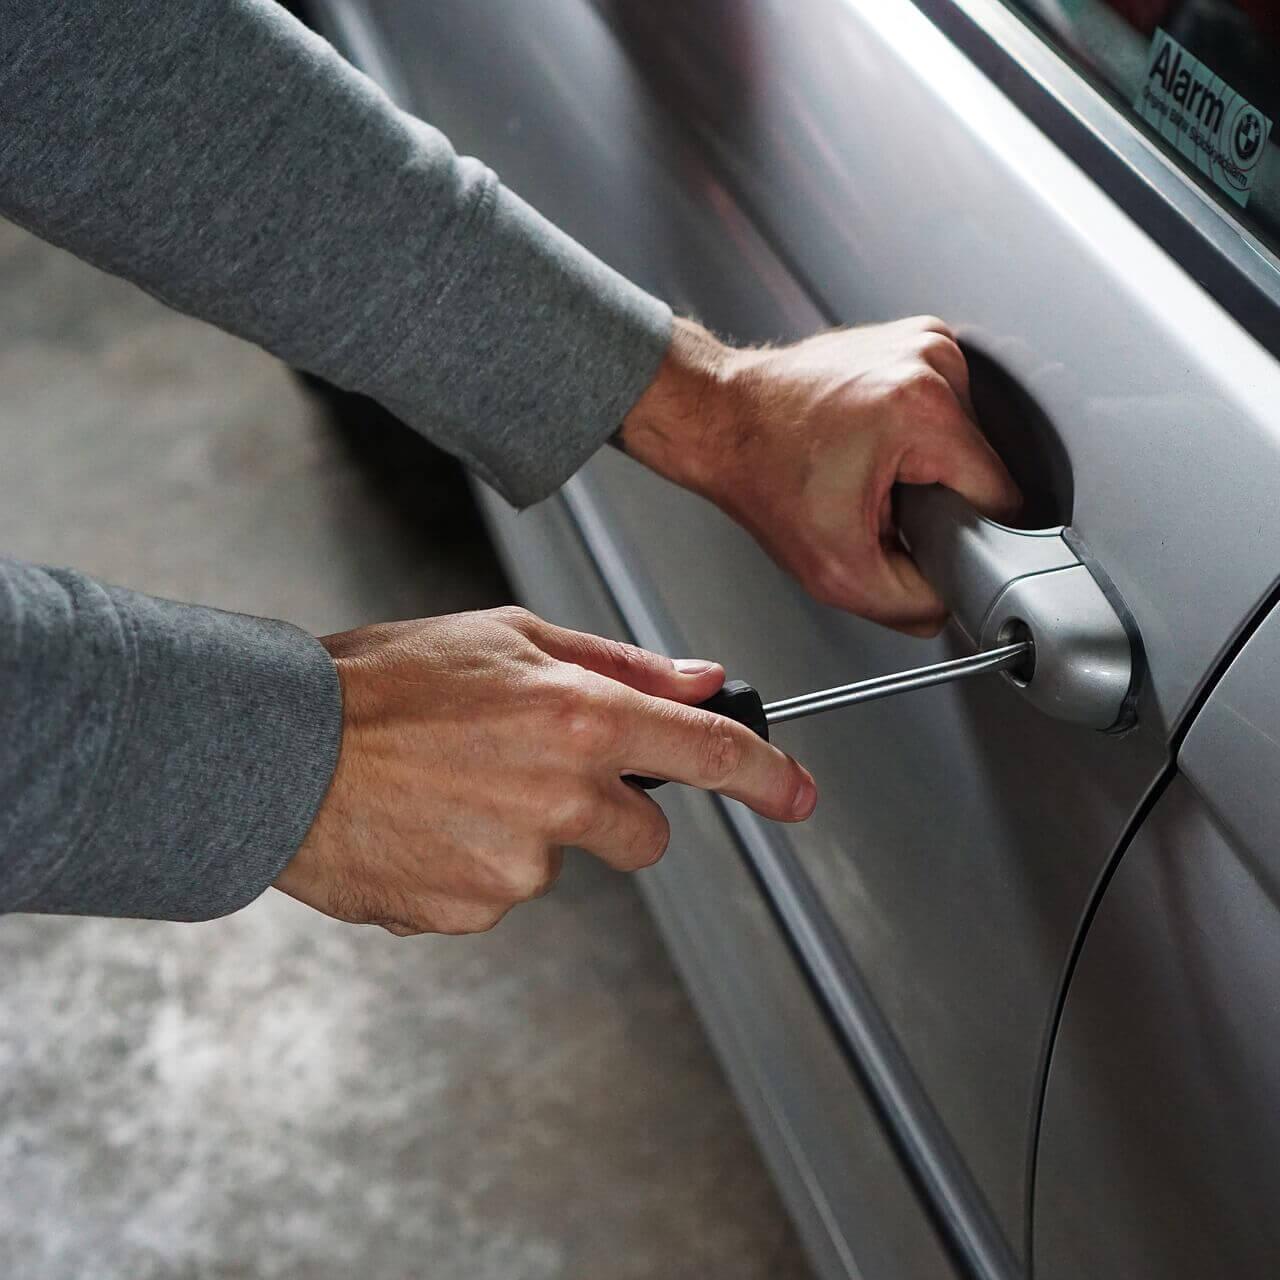 Localizador GPS para robo de vehículos